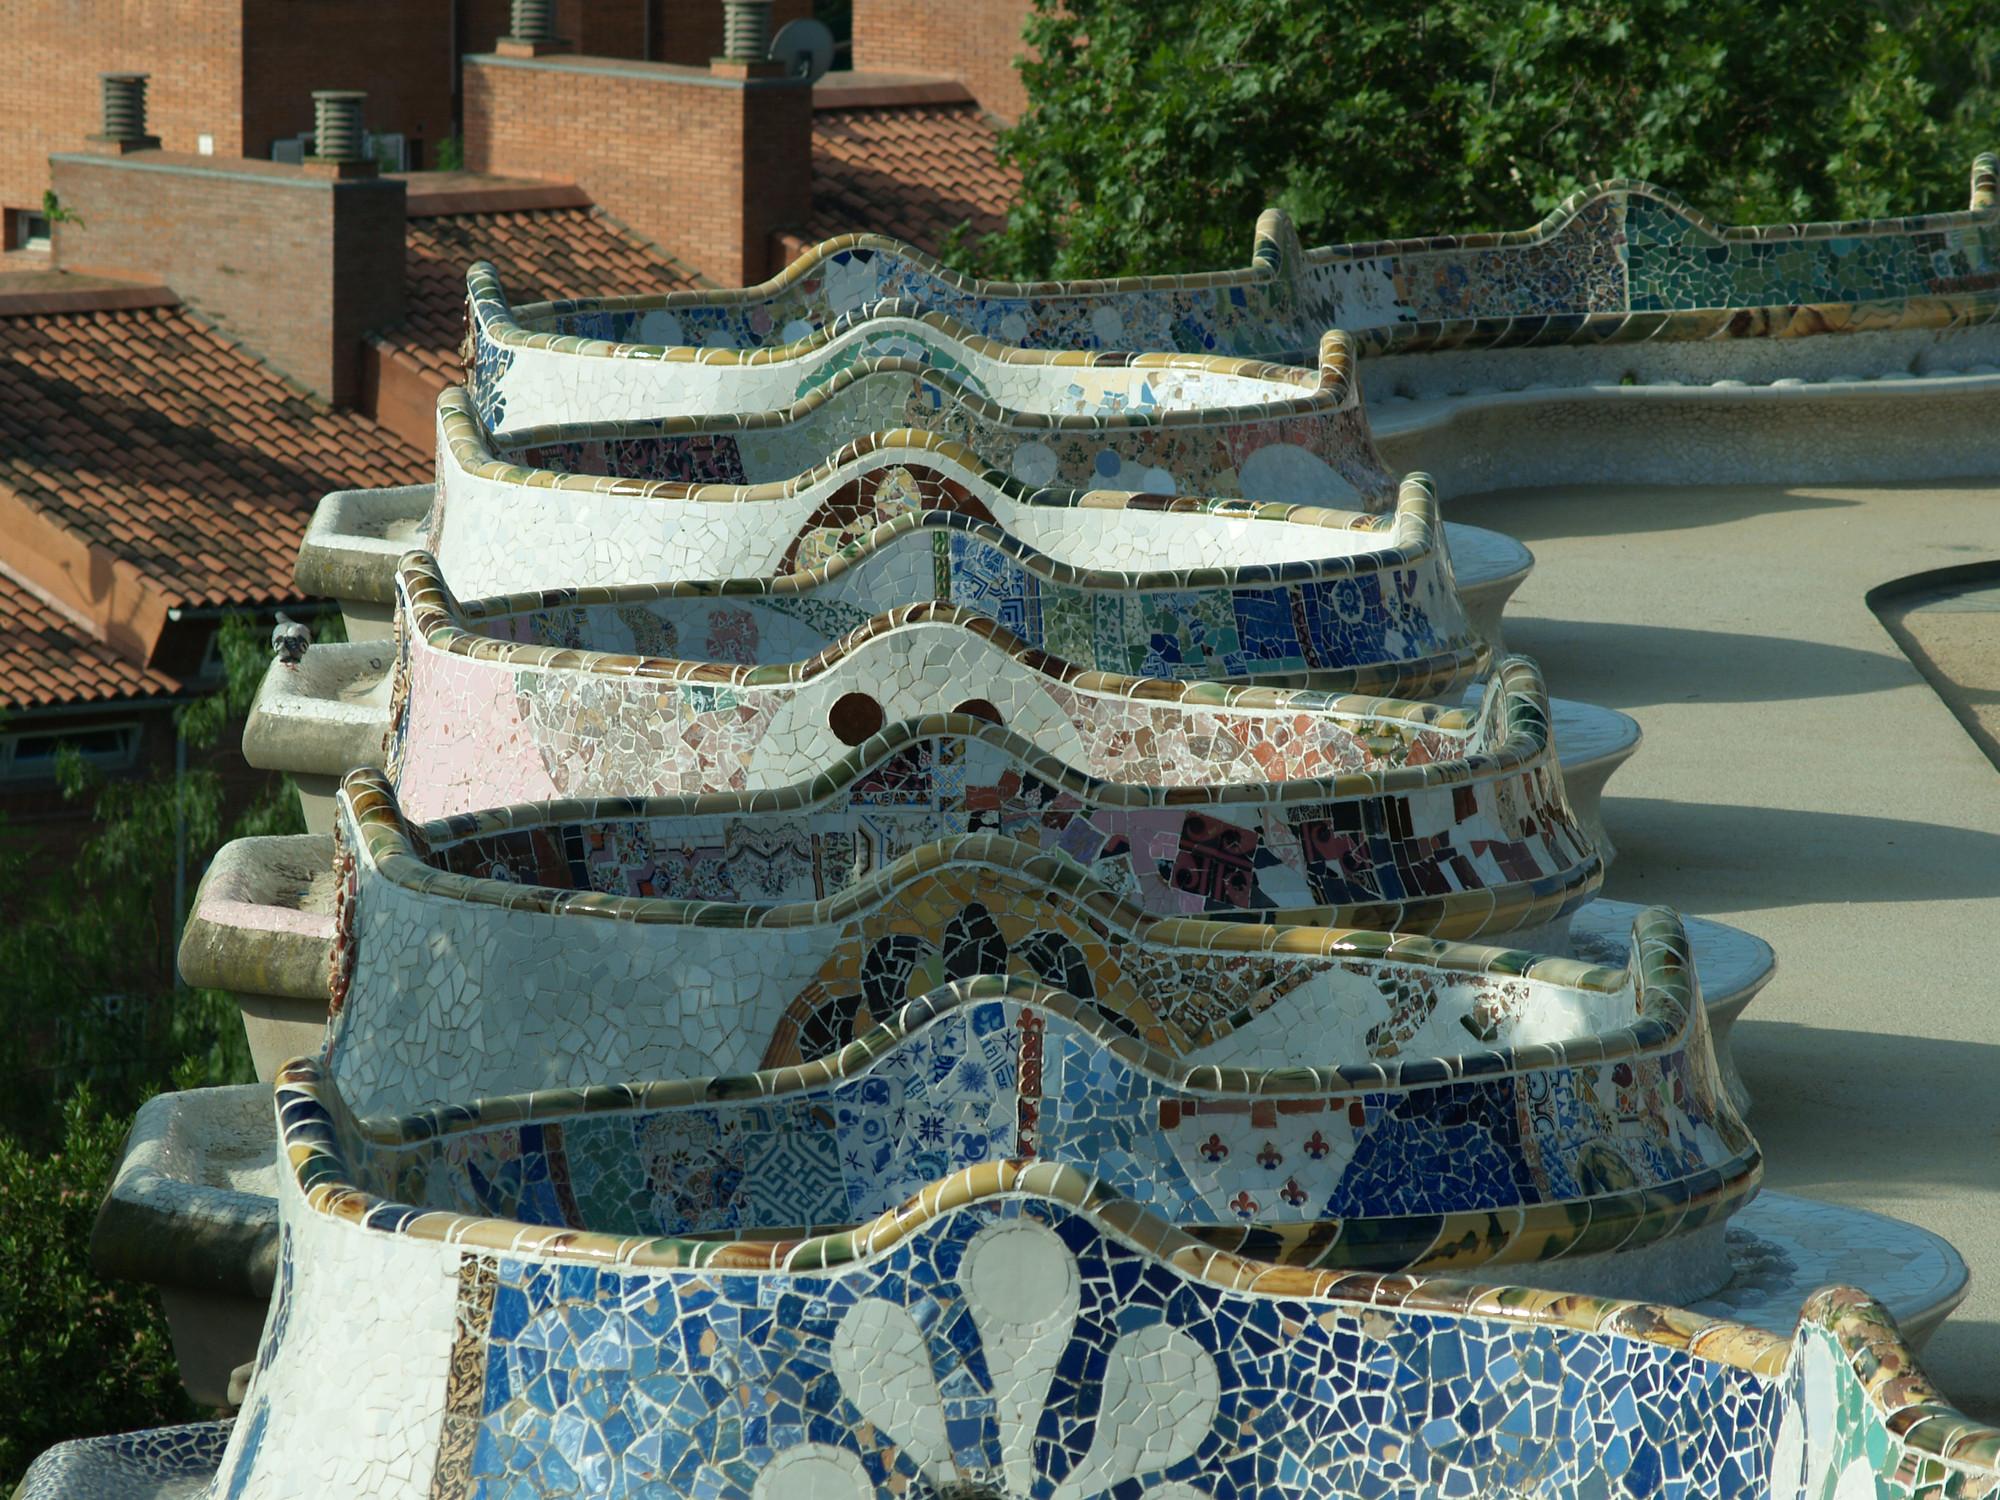 © Restauración Parc Guell © Ceramica Cumella